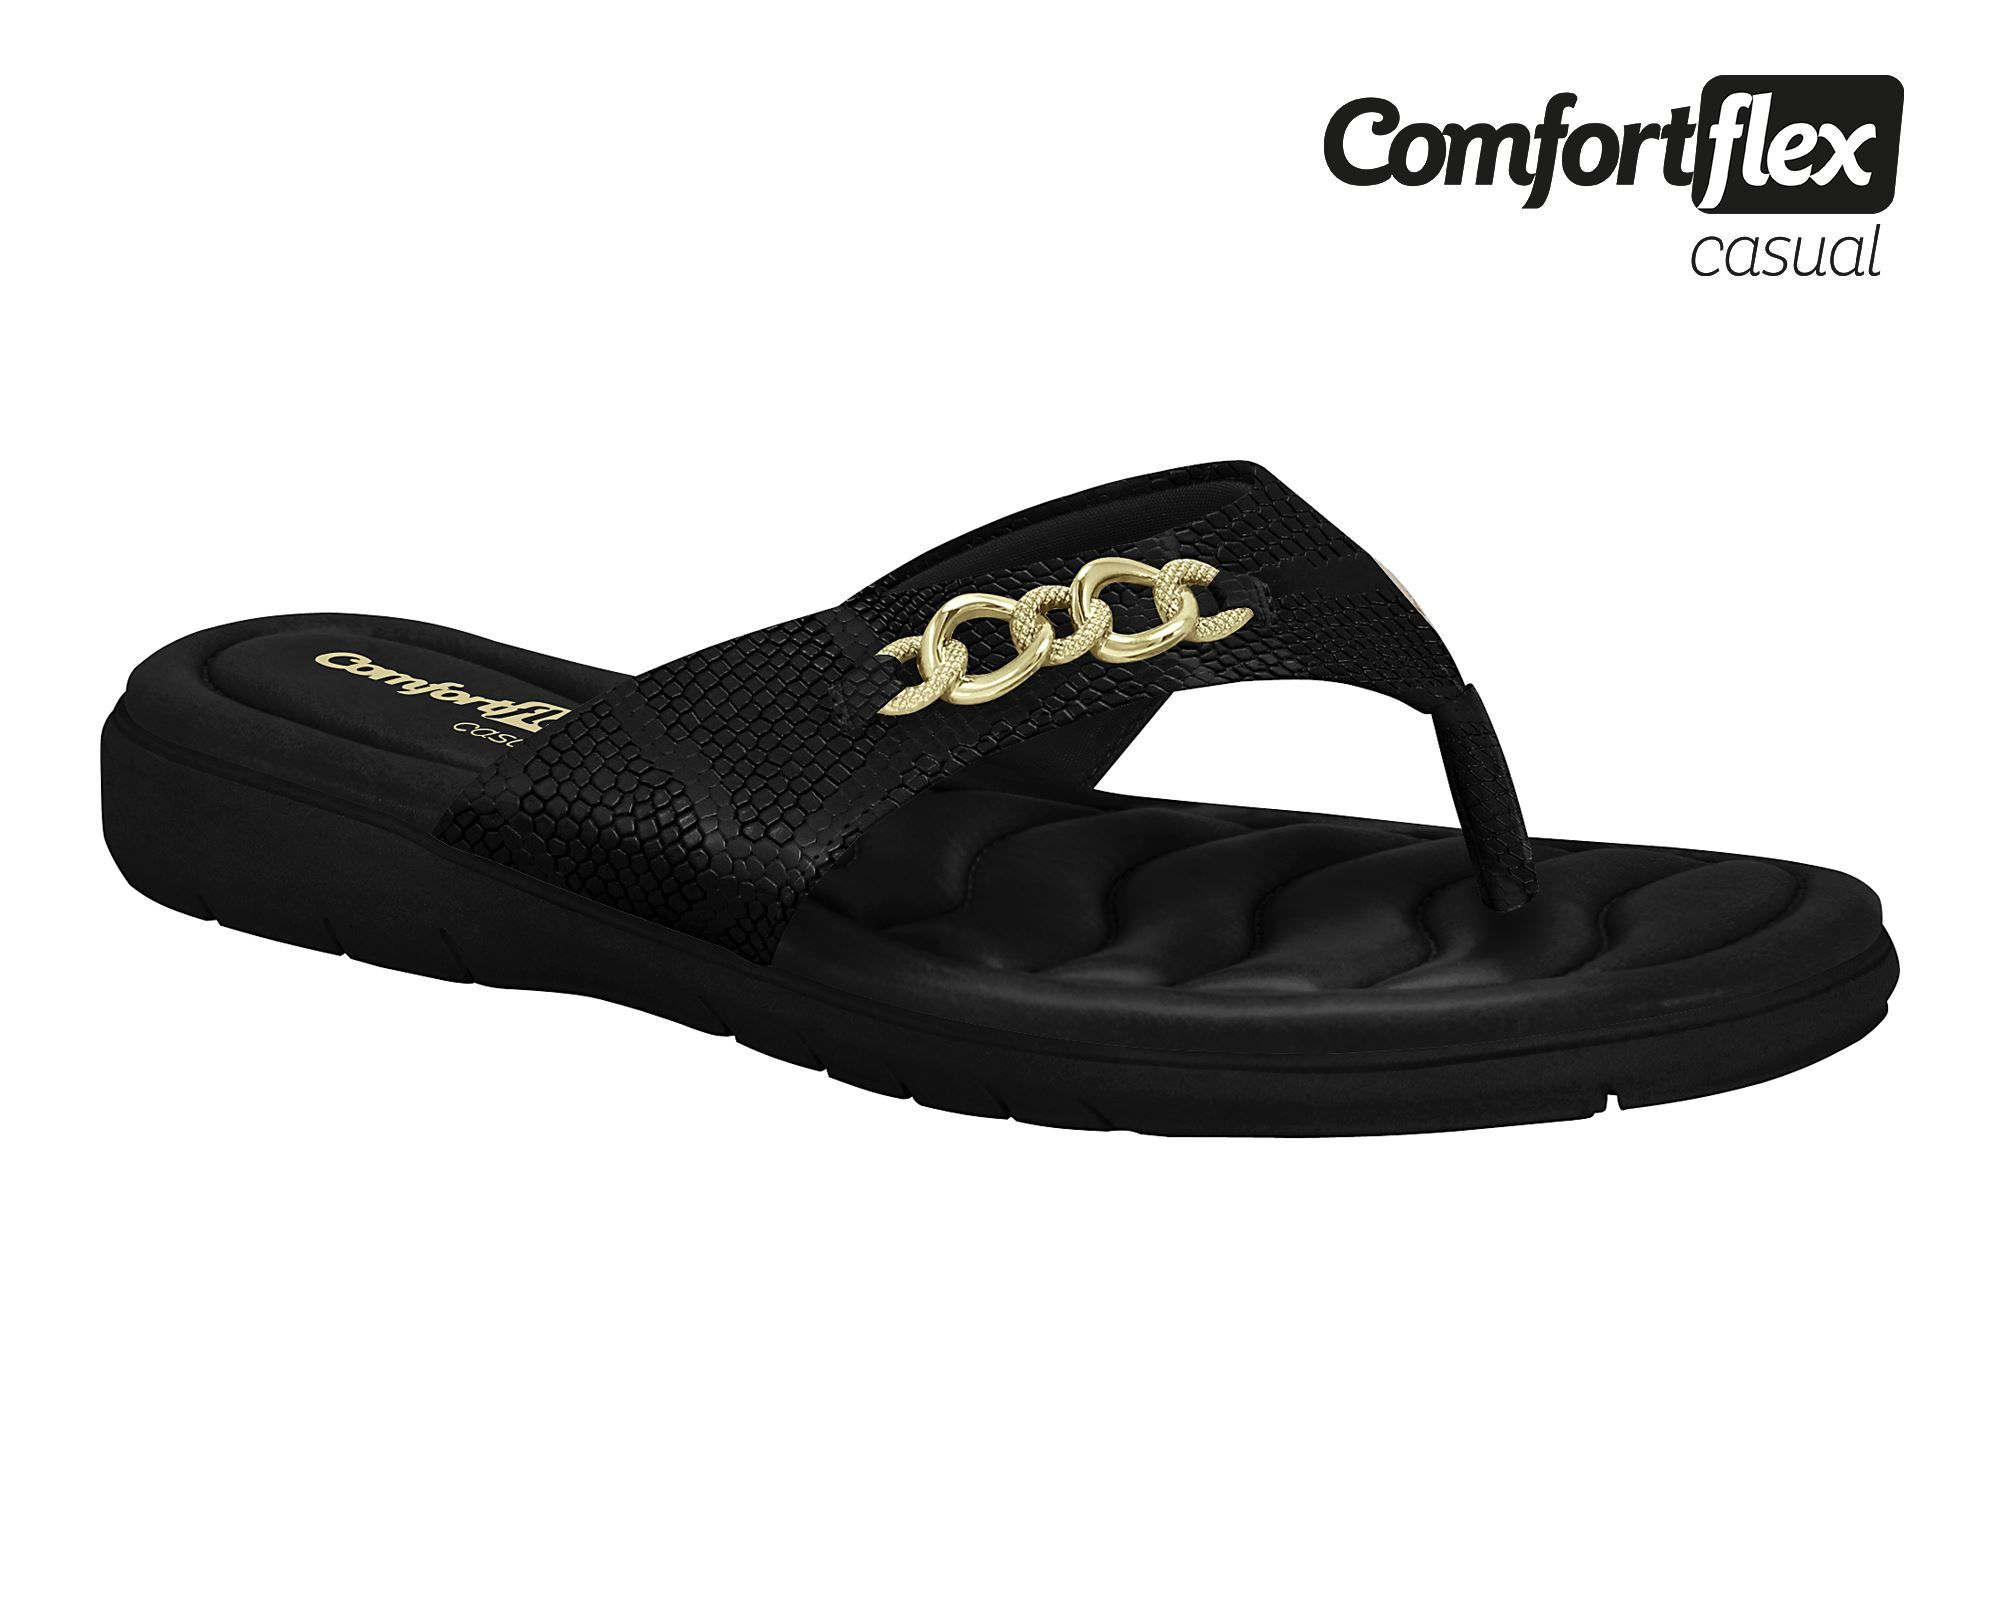 Tamanco Chinelo Comfortflex Casual 1980 Feminino Conforto